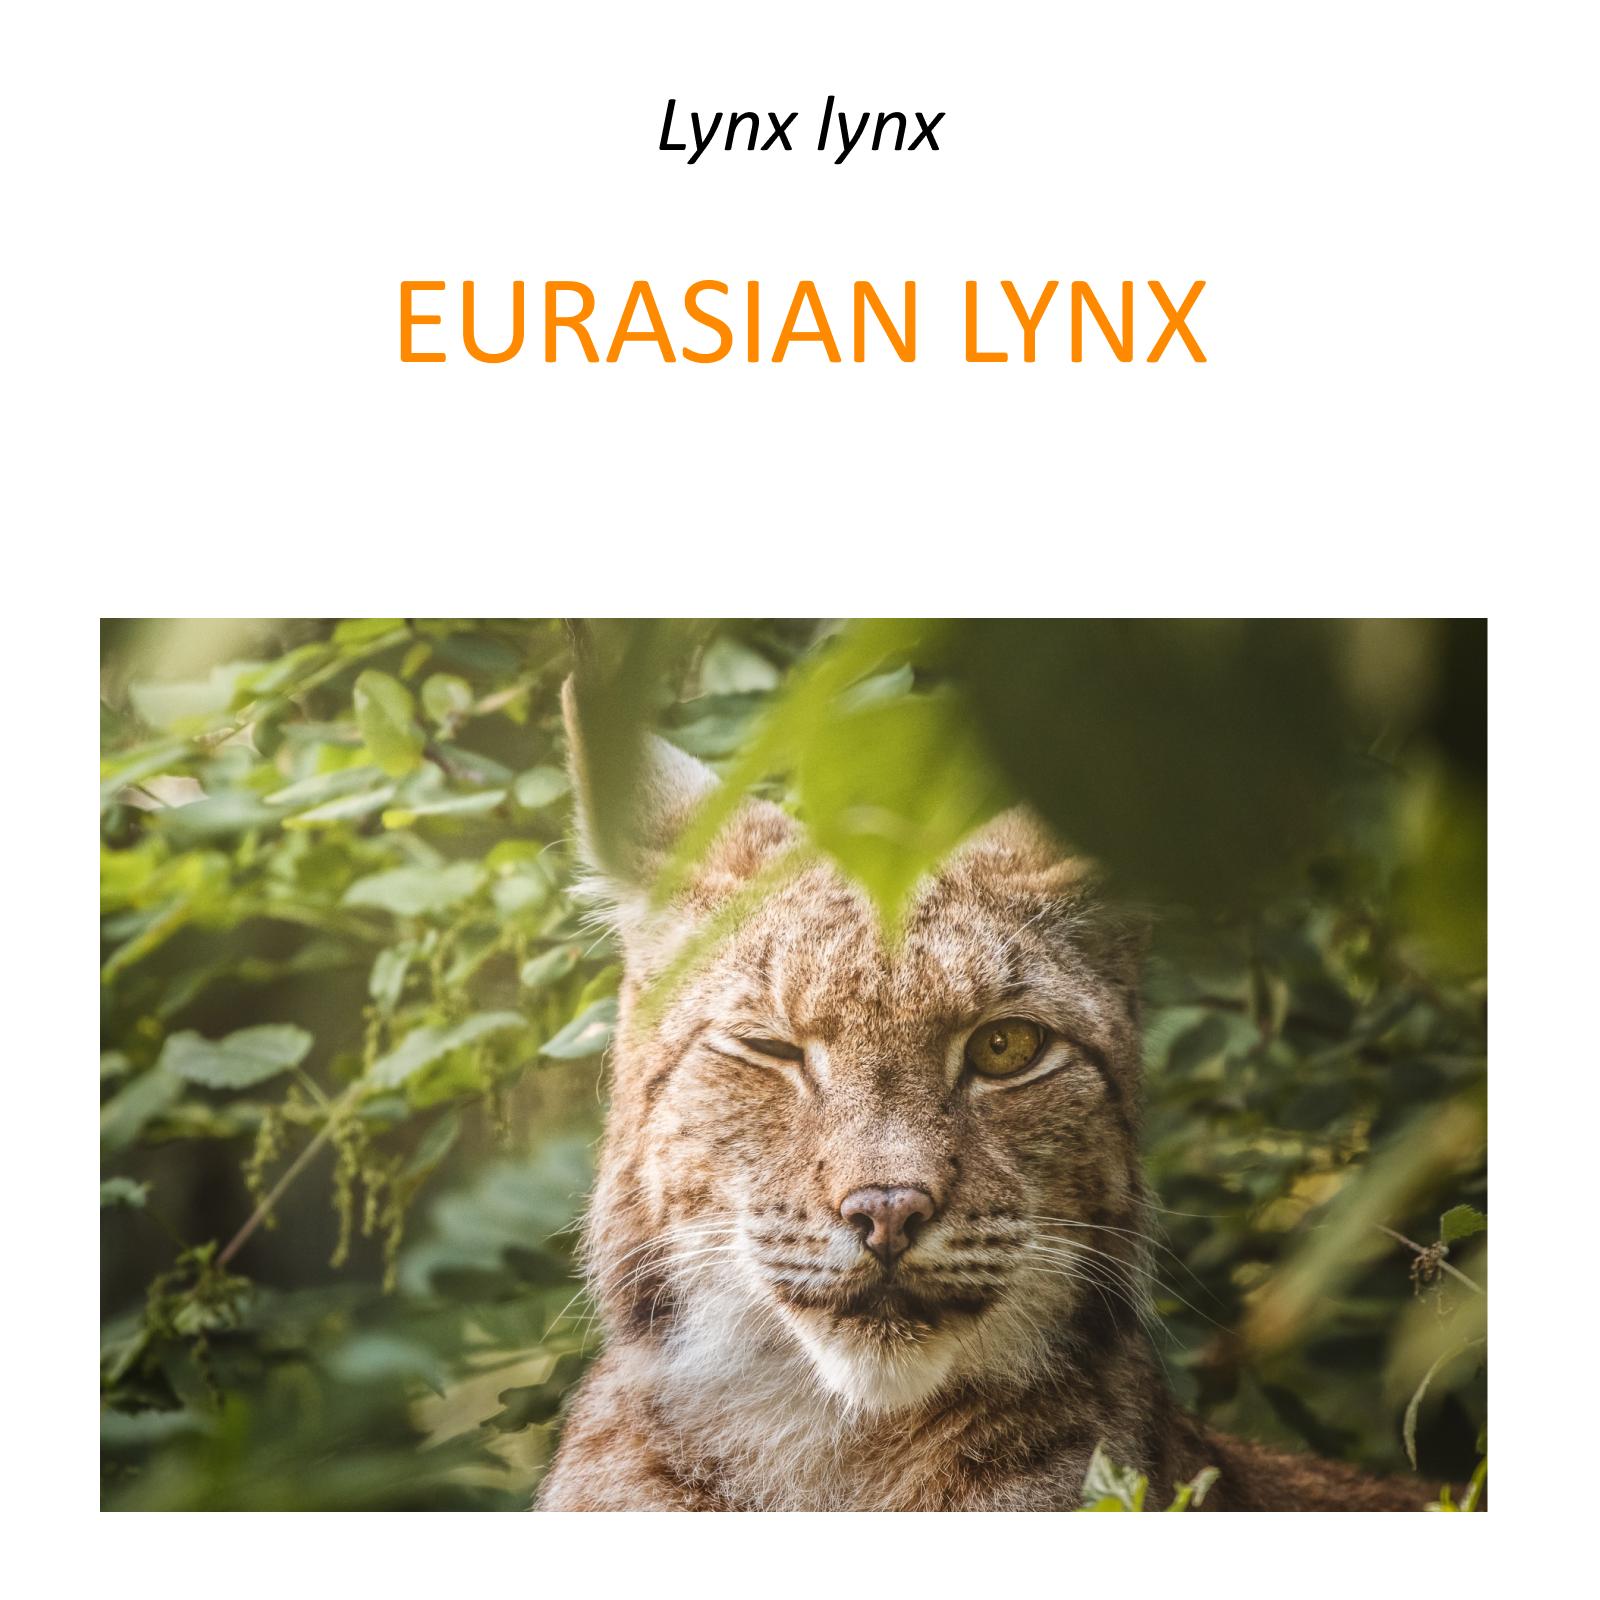 Euroasian lynx conservation program in Poland